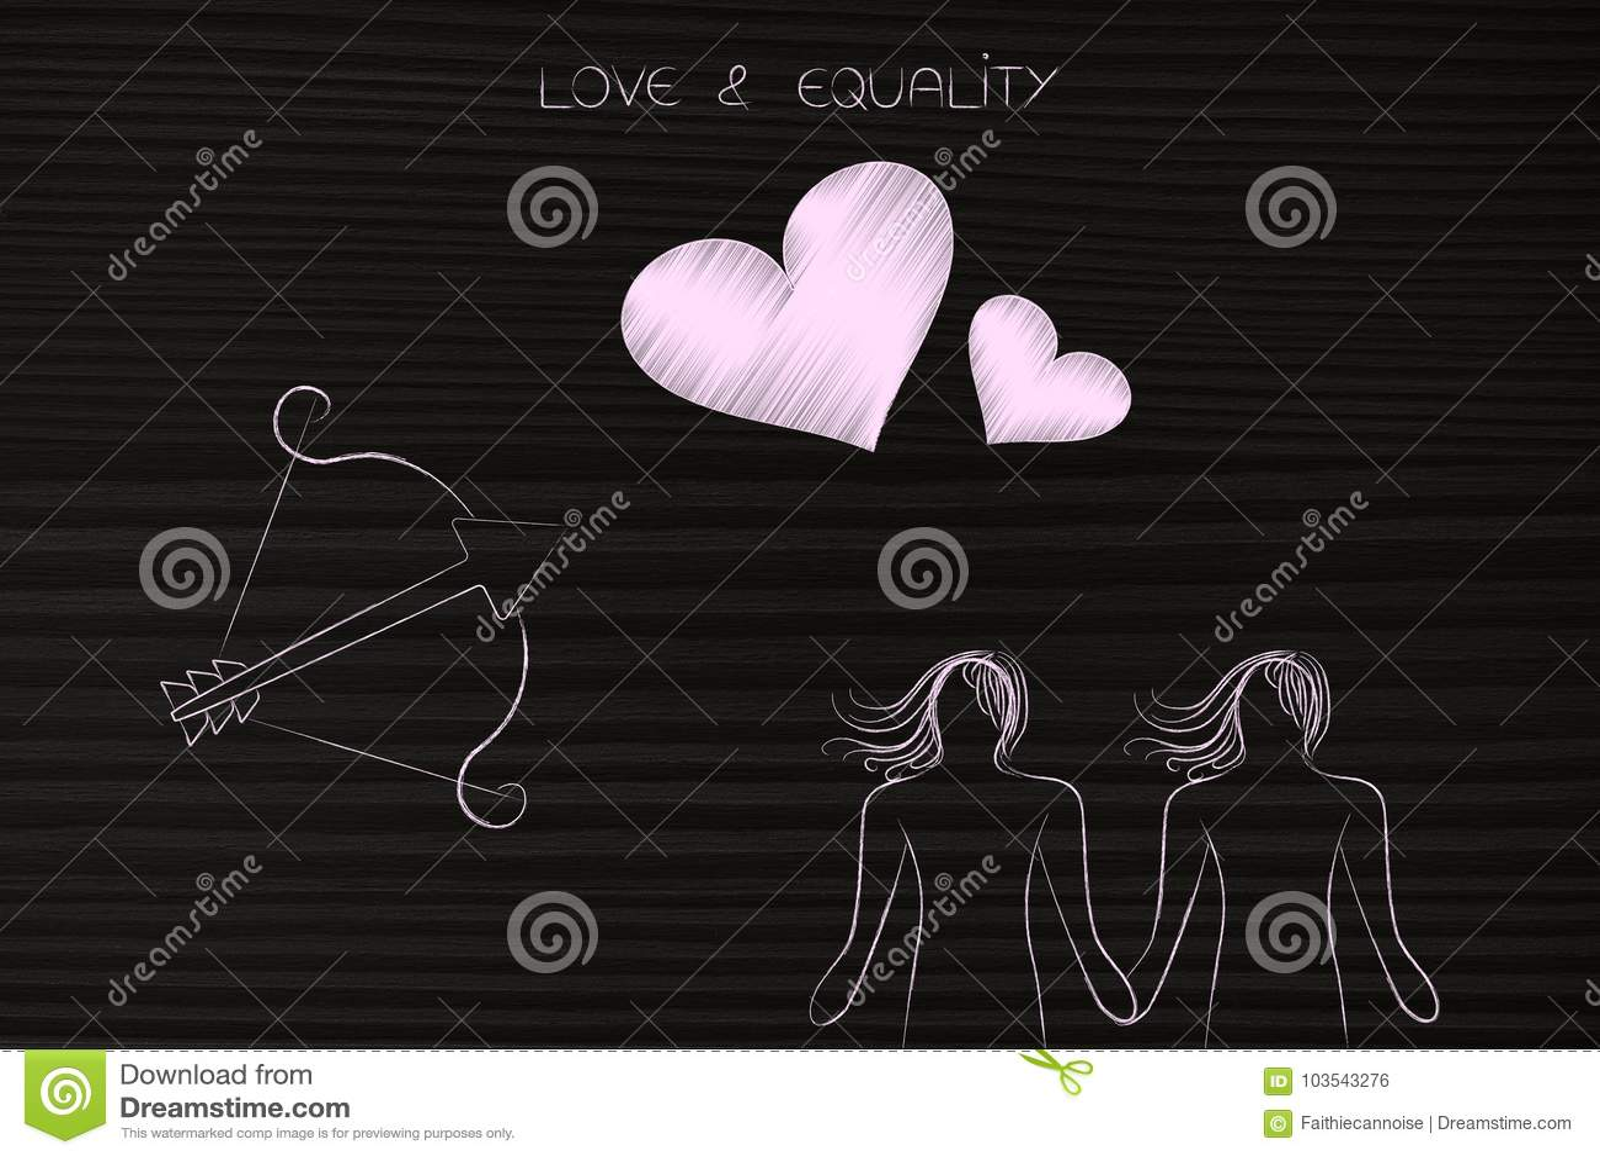 Cupids love lesbian